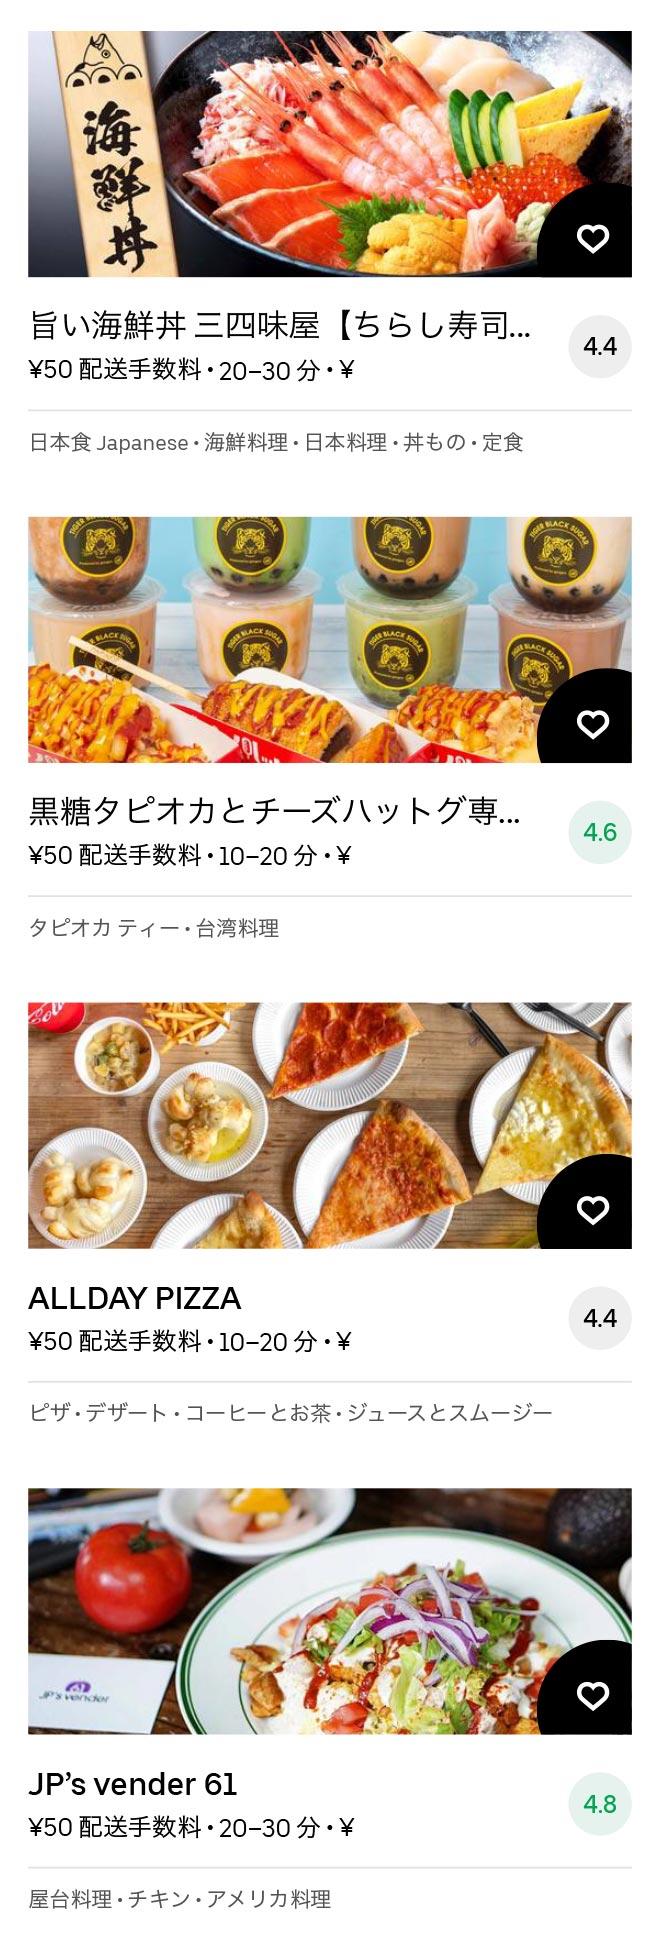 Okayama menu 2011 10